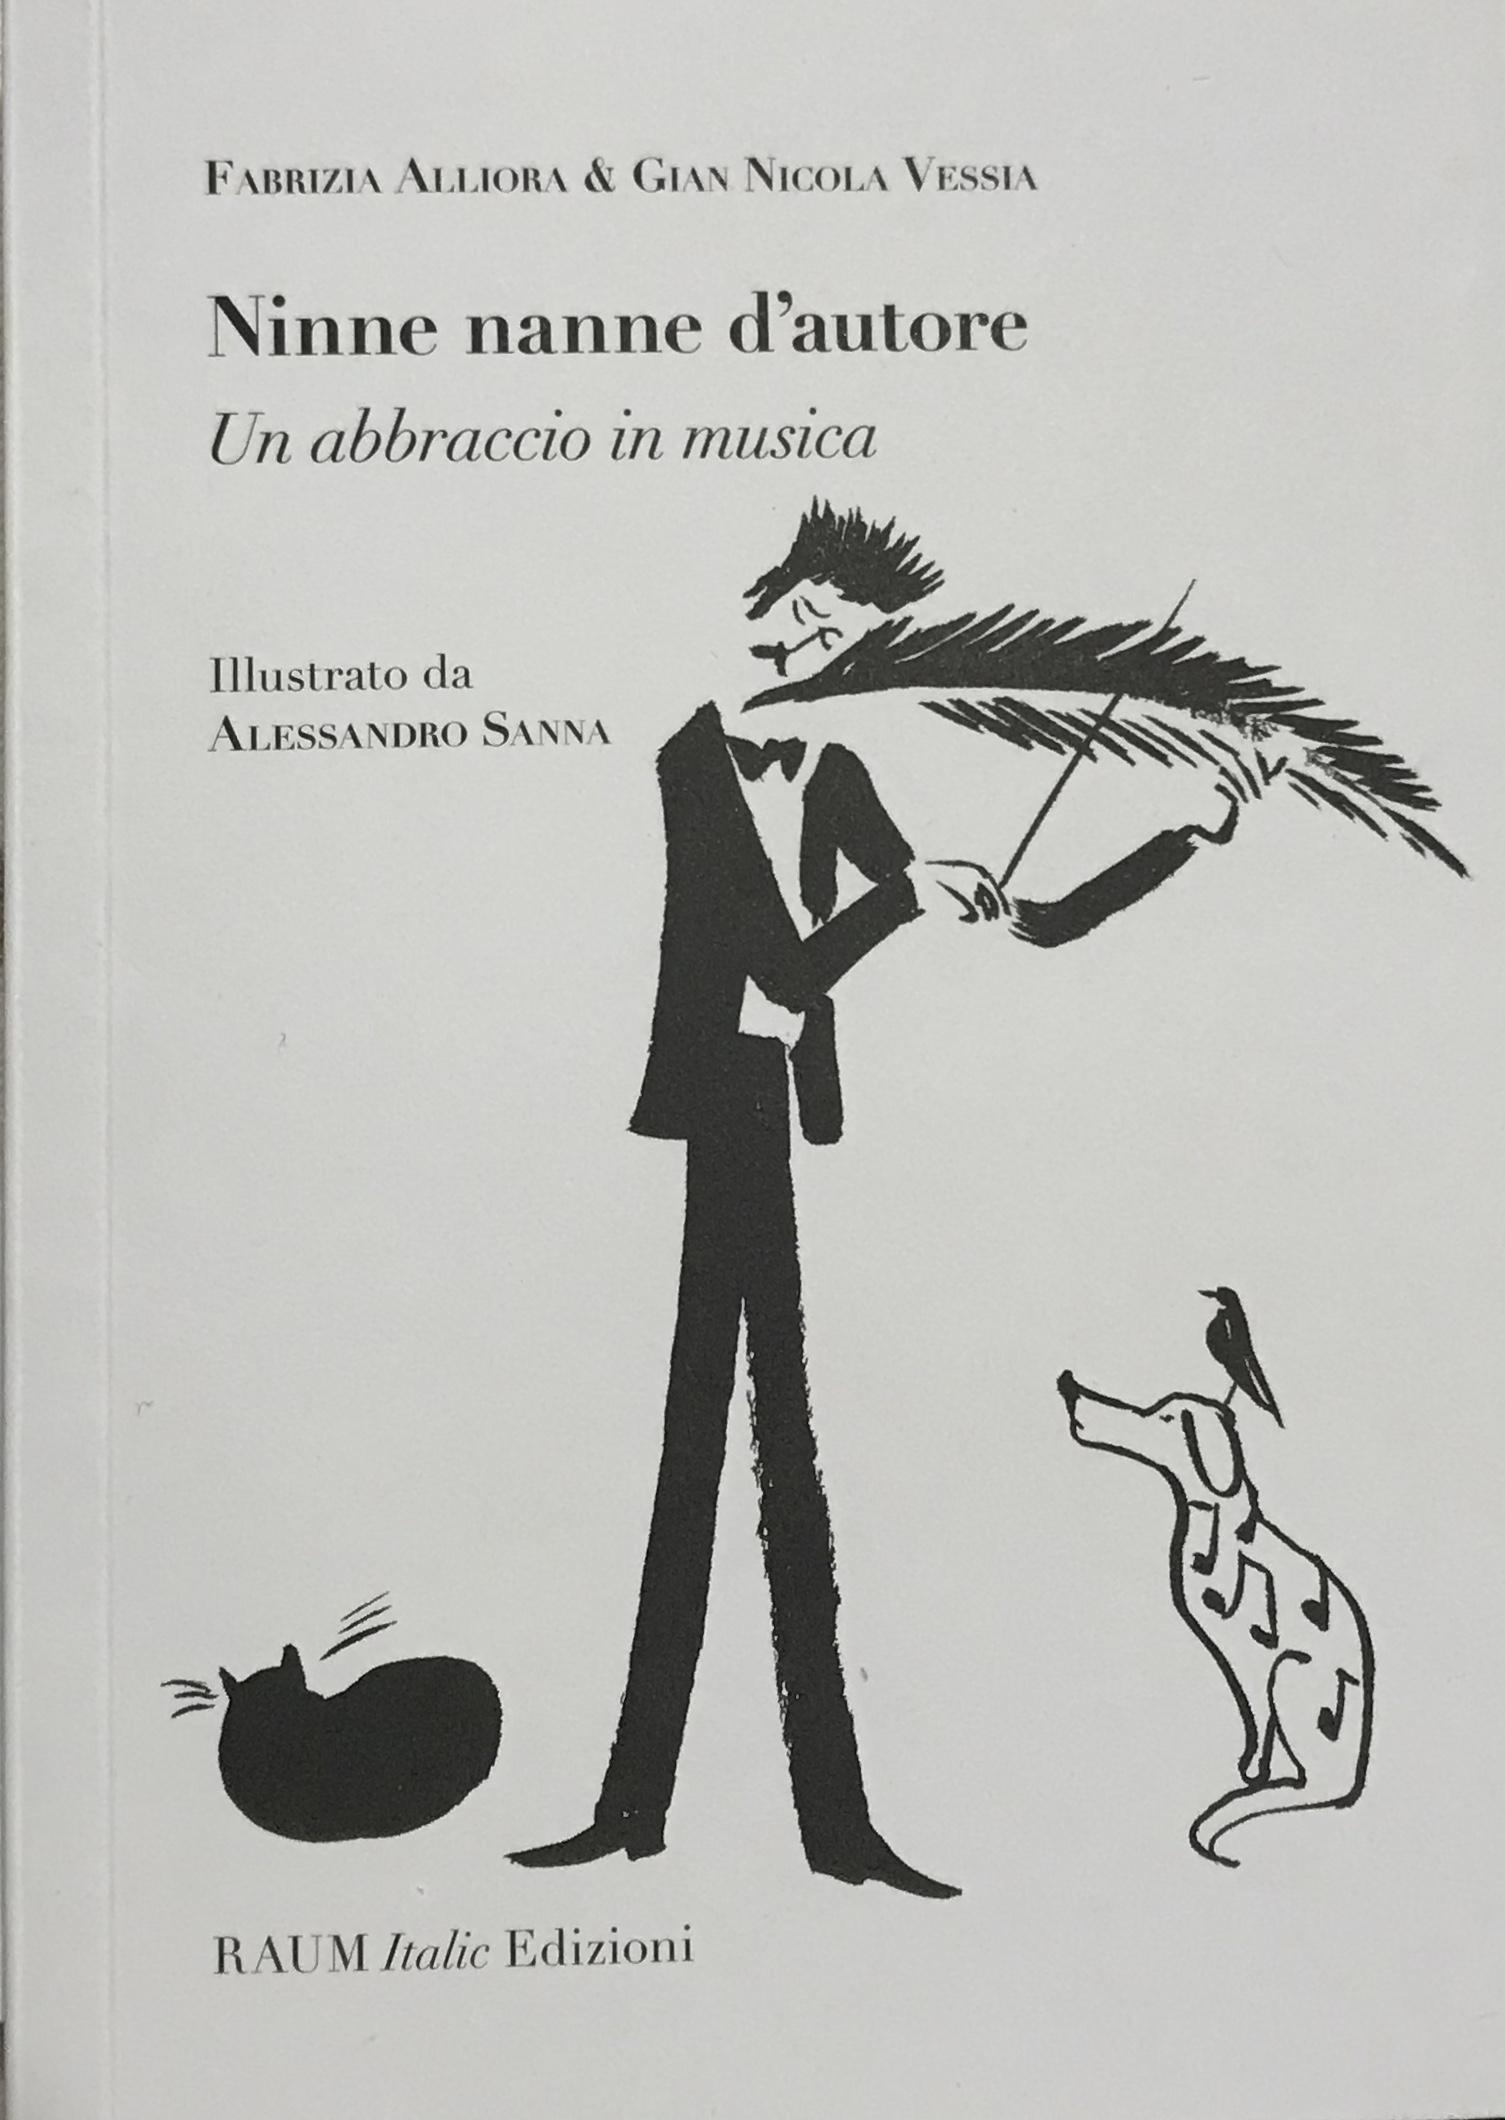 Ninne nanne d'autore